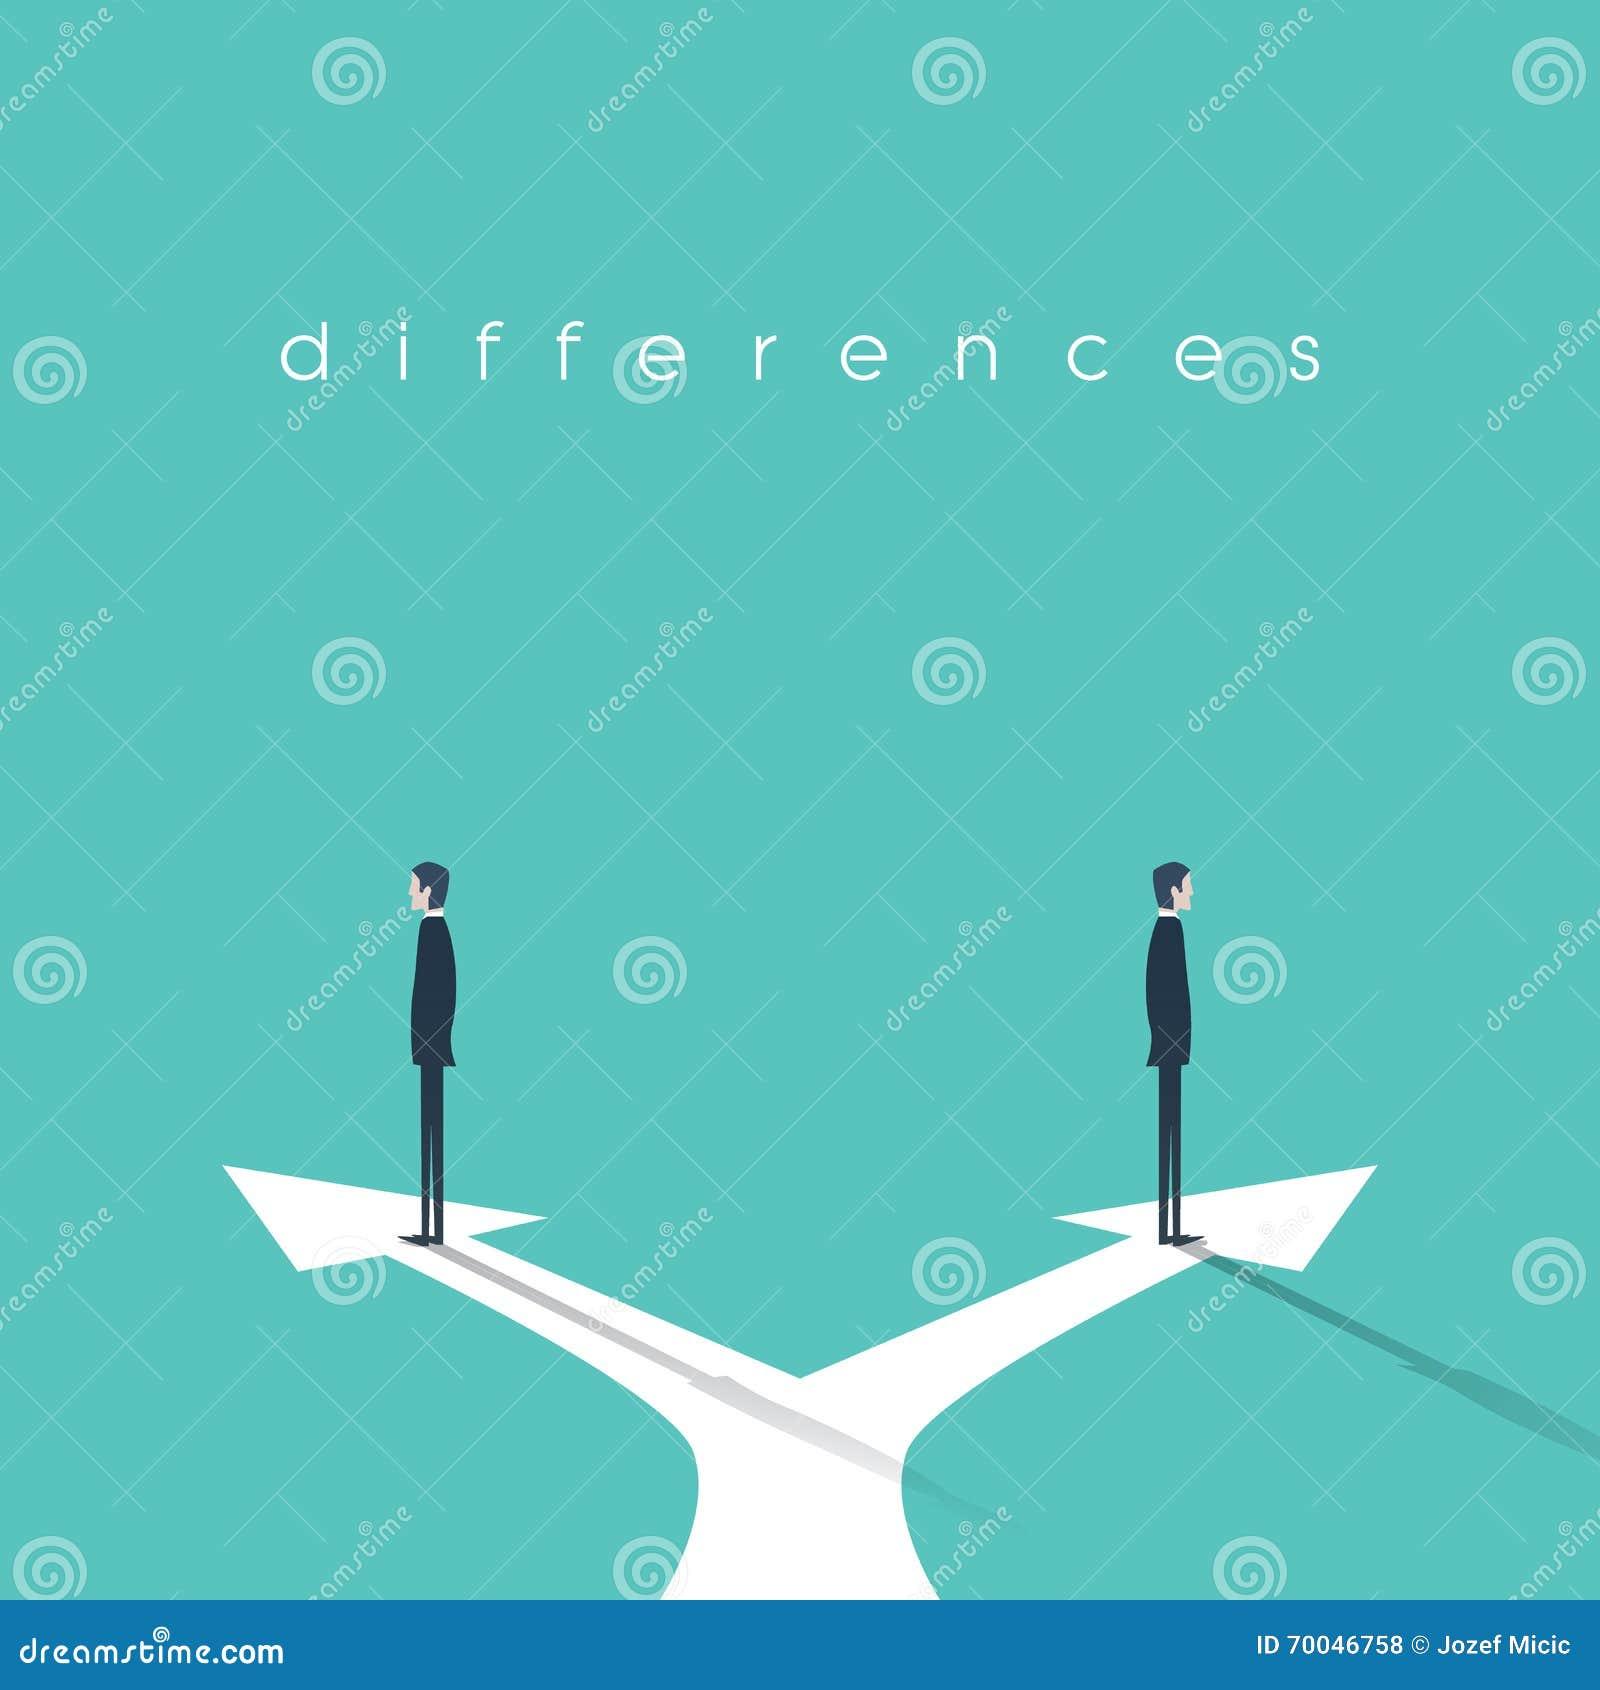 Conceito do negcio da confrontao de opinies diferentes e de conceito do negcio da confrontao de opinies diferentes e de desacordo dois homens de negcios que esto em sentidos opostos ccuart Gallery